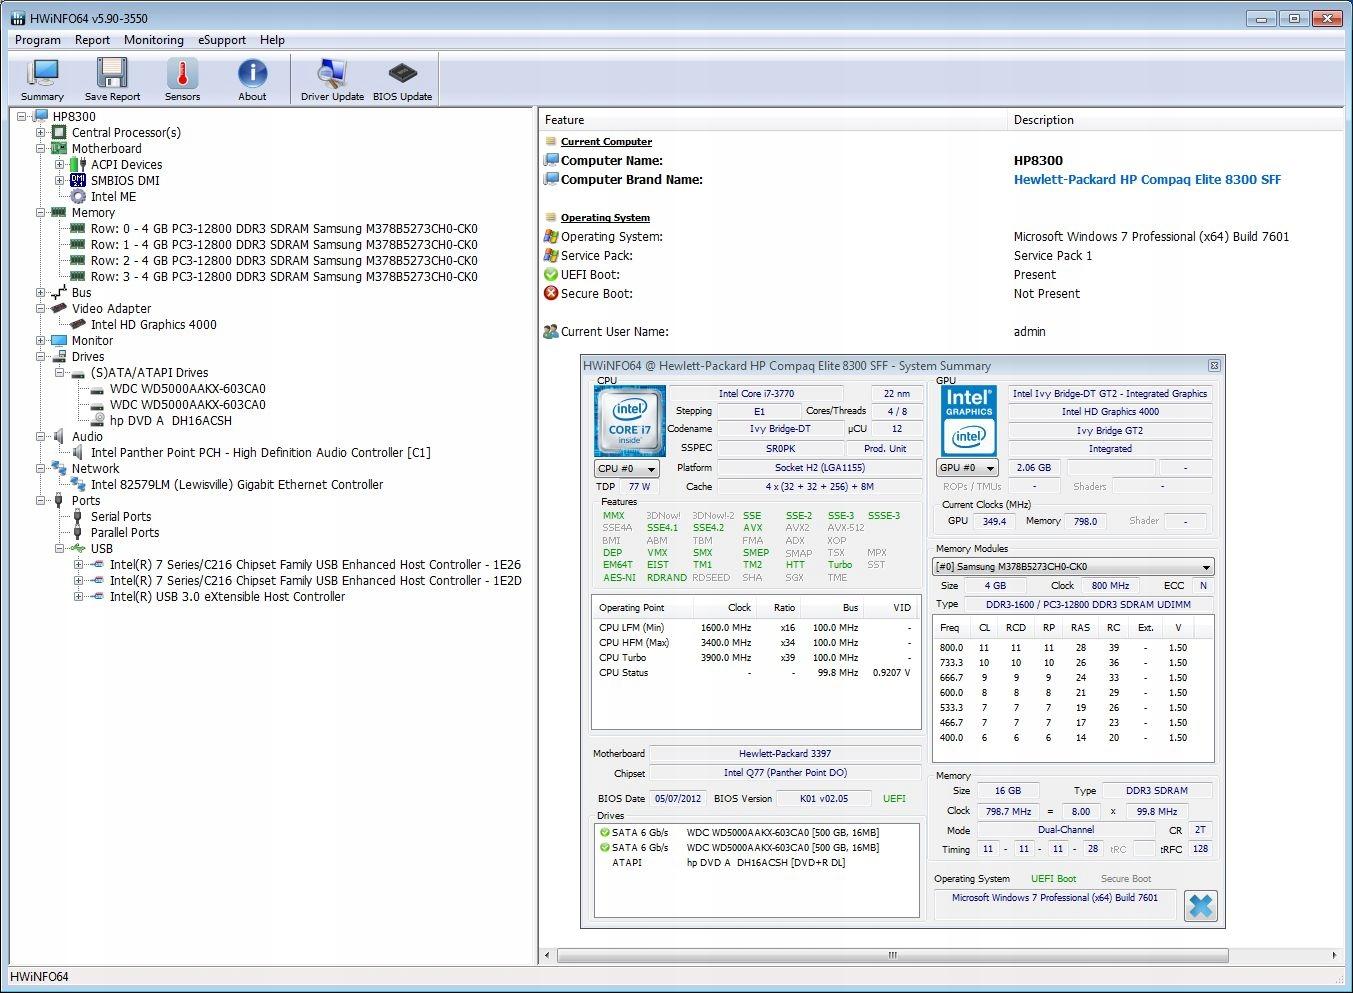 HP 8300 i7-3770 @ 3 40GHz 16 GB RAM 1TB HDD WiN7 - 7668690845